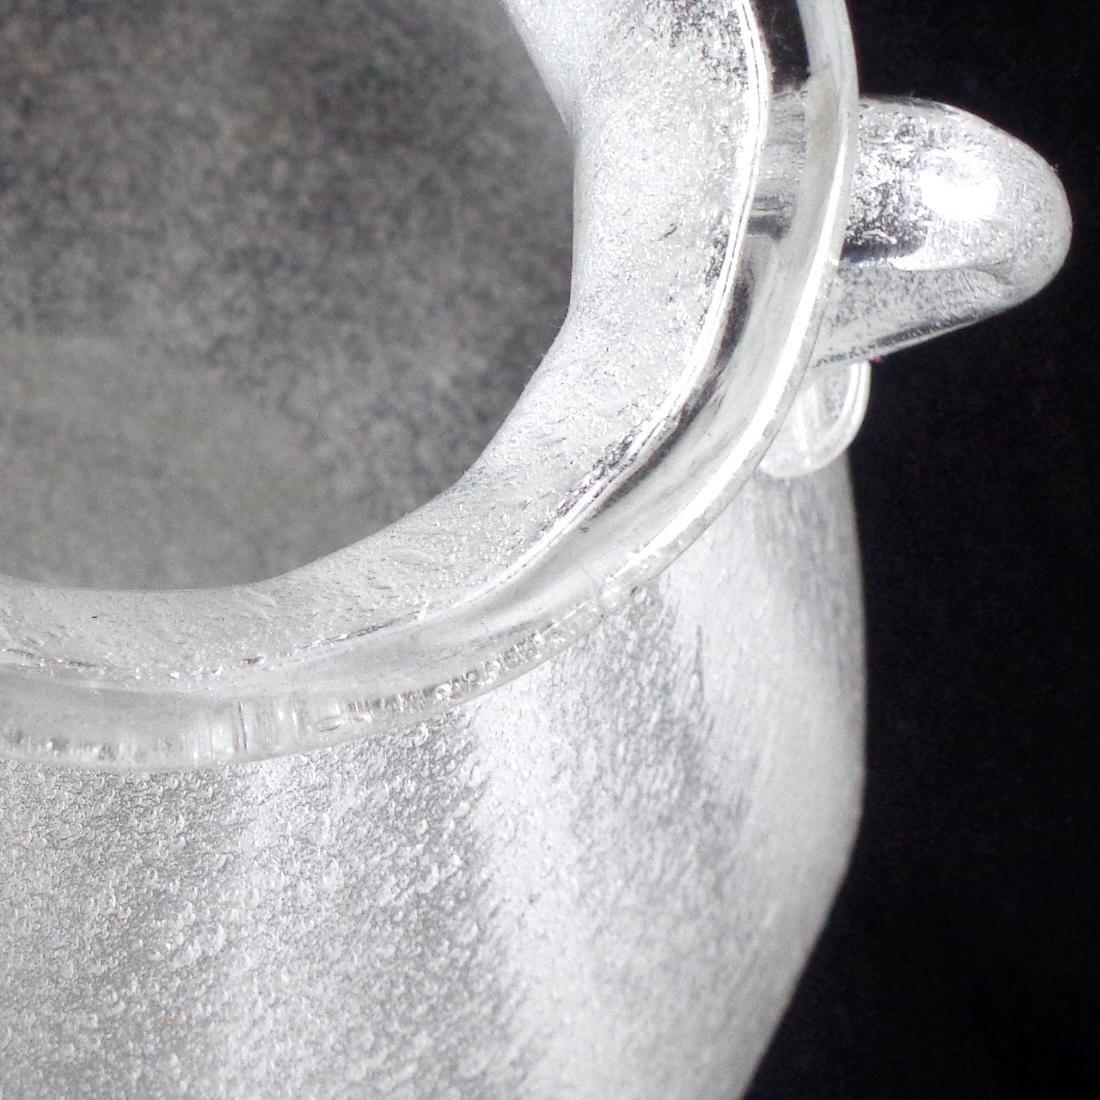 Seguso Vetri D'Arte Murano Early Pulegoso Glass Vase - 3